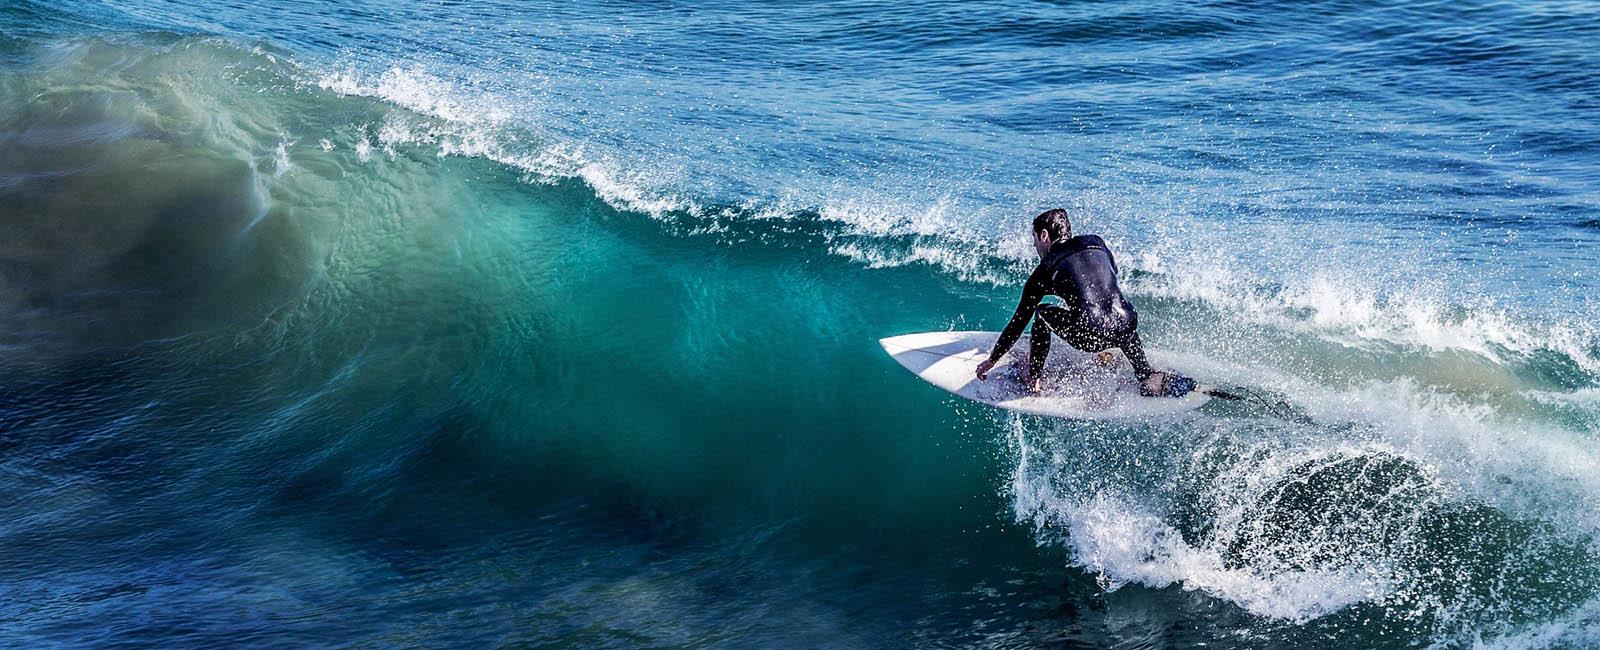 surf-kynay2-1